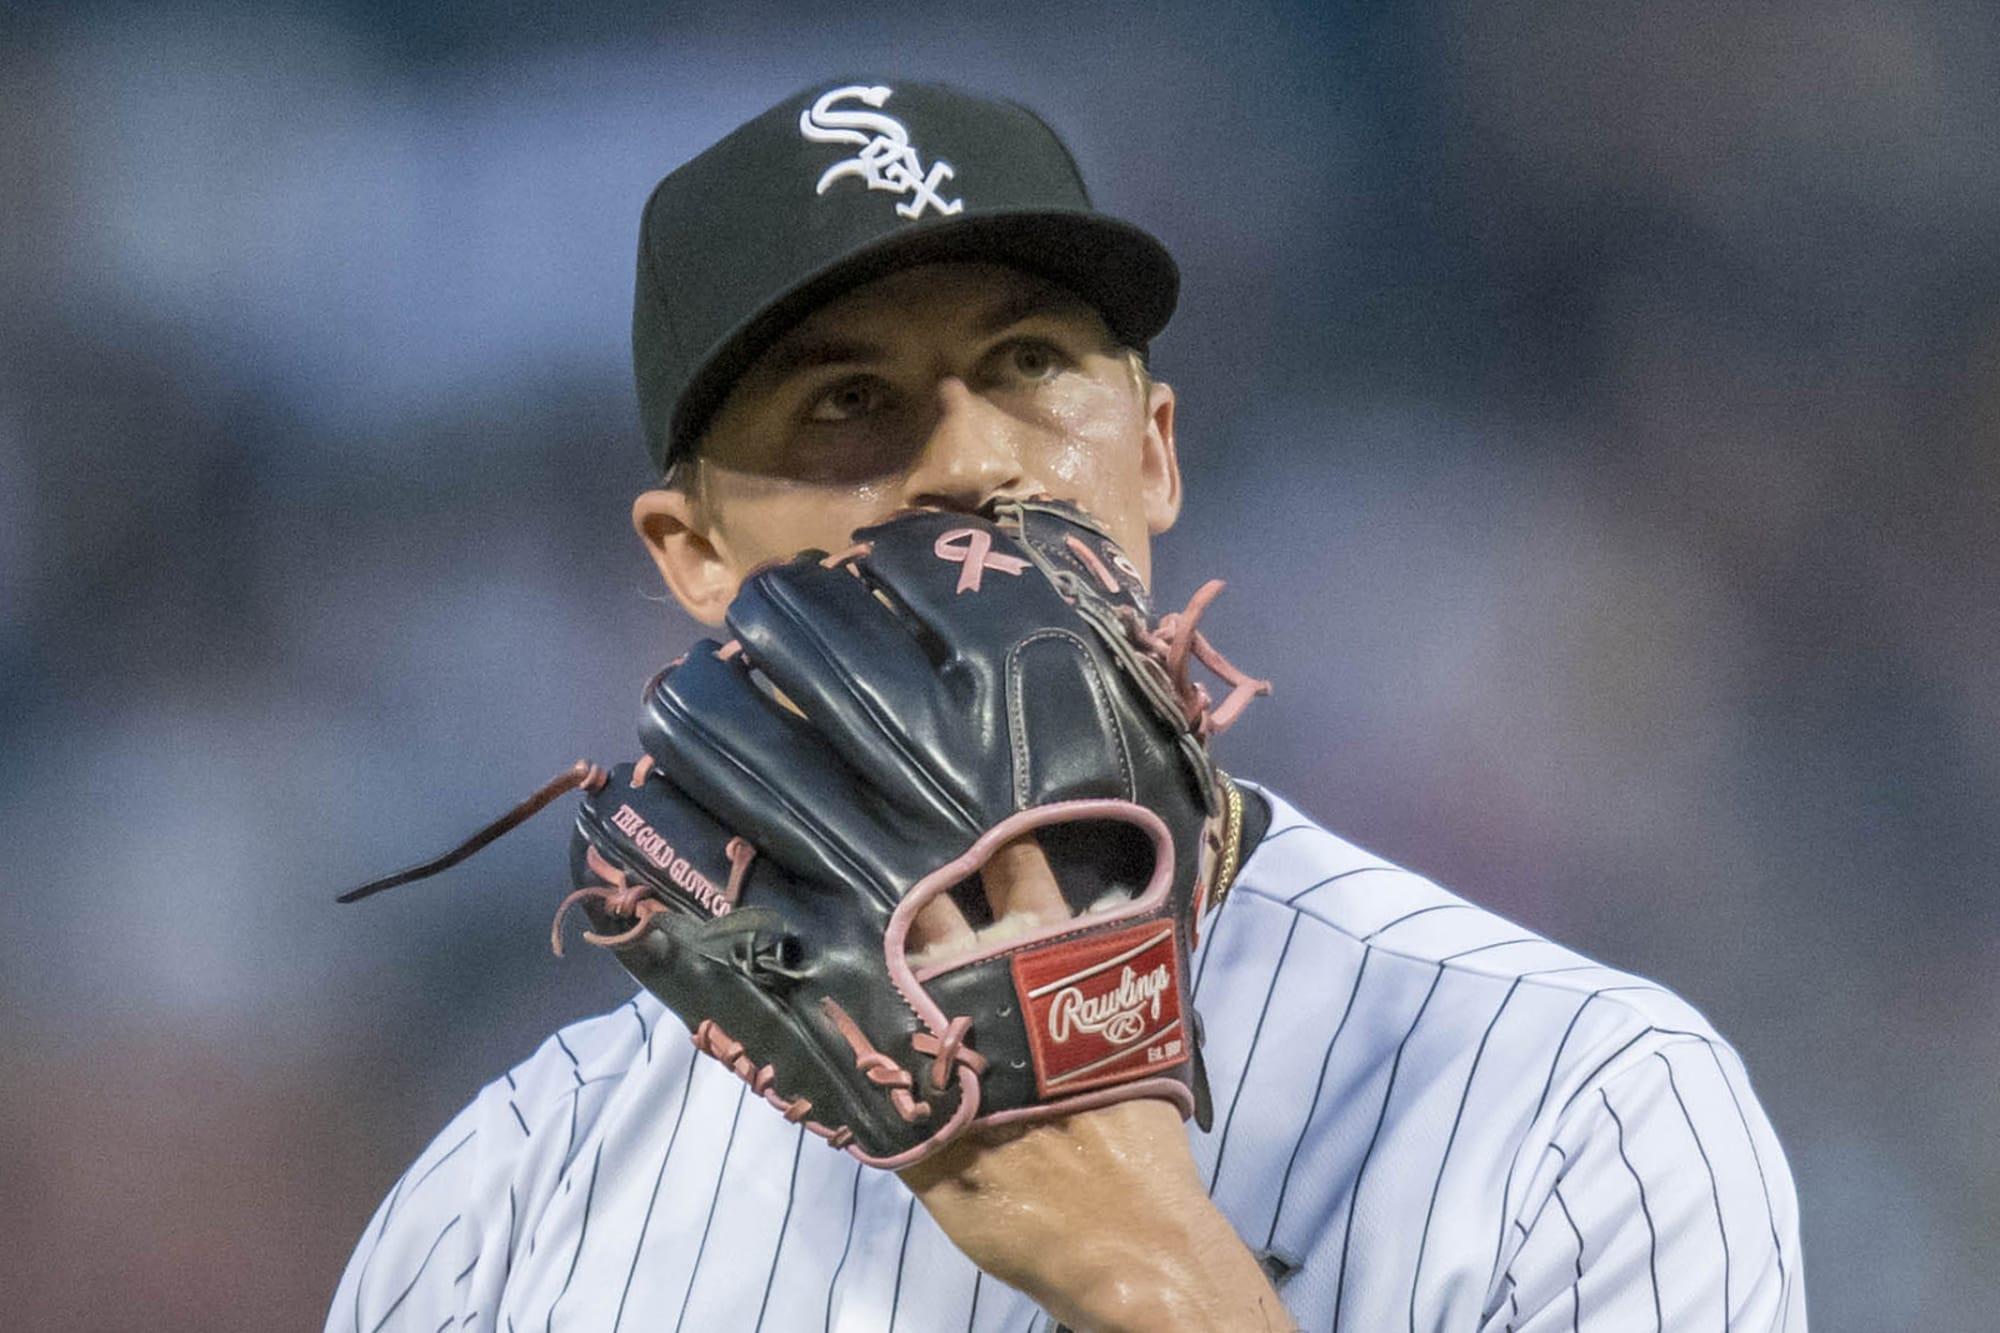 White Sox fans dragging terrible mock trade involving Michael Kopech